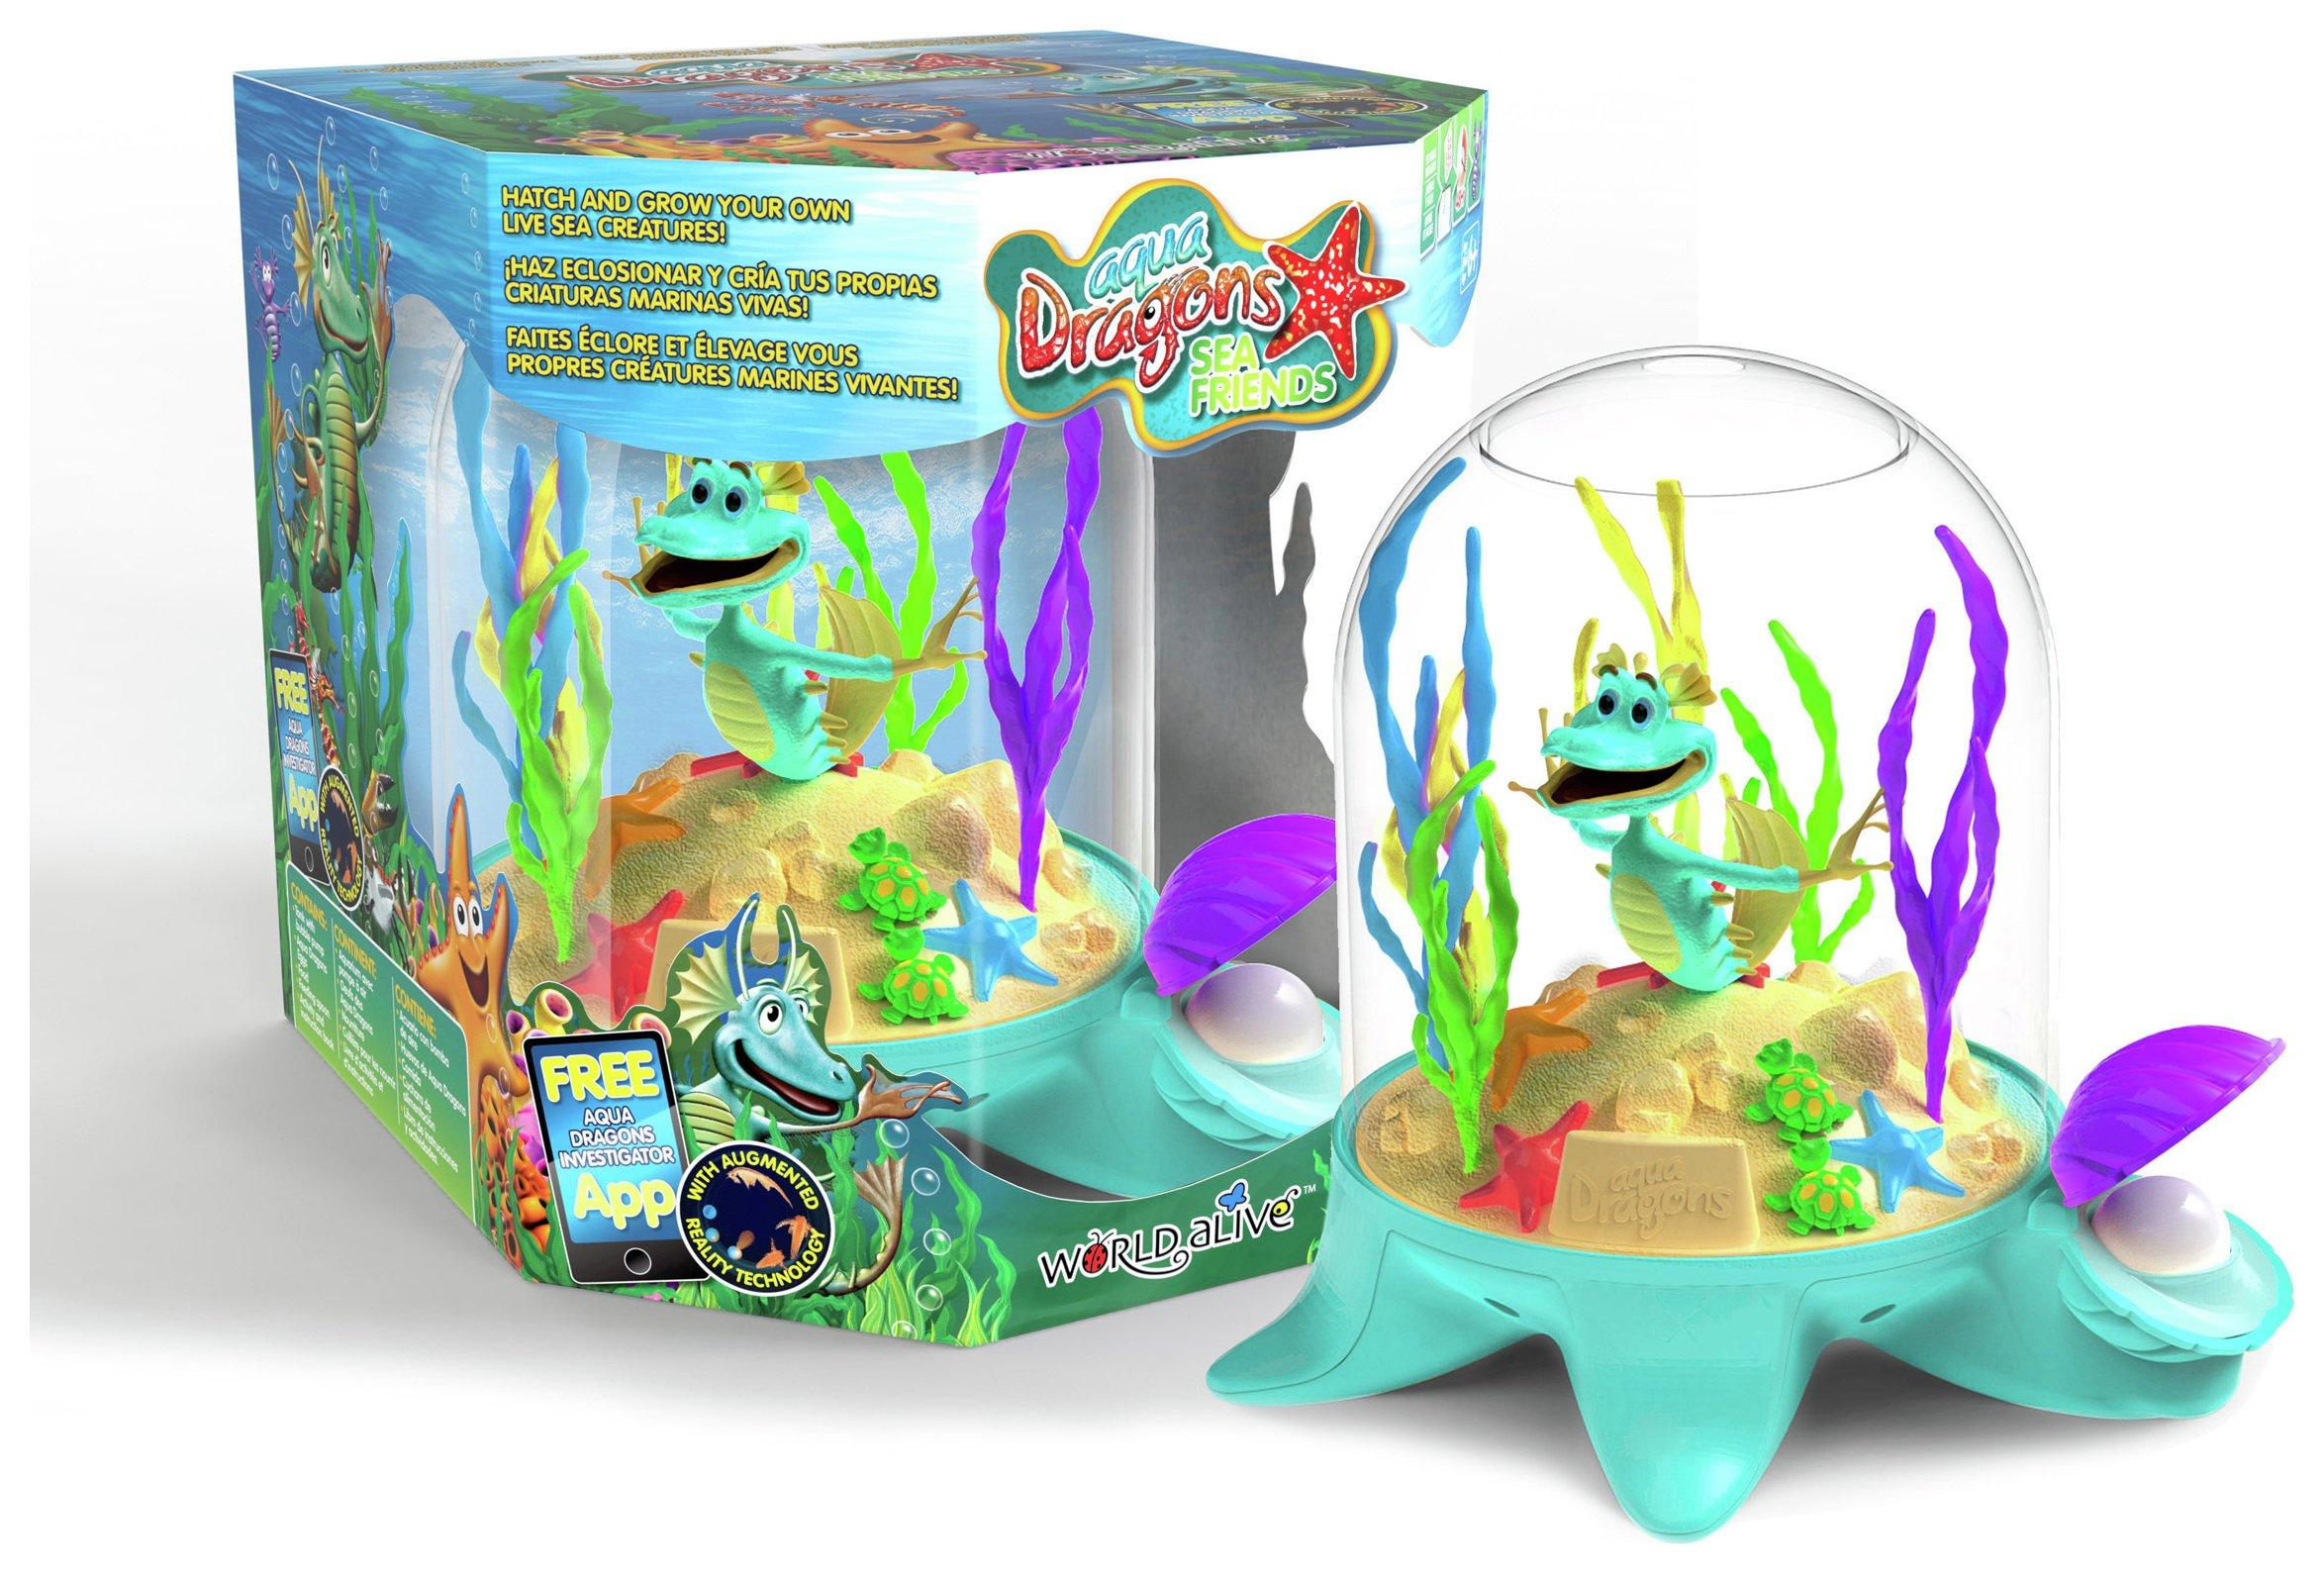 Image of Aqua Dragons Sea Friends Deluxe.